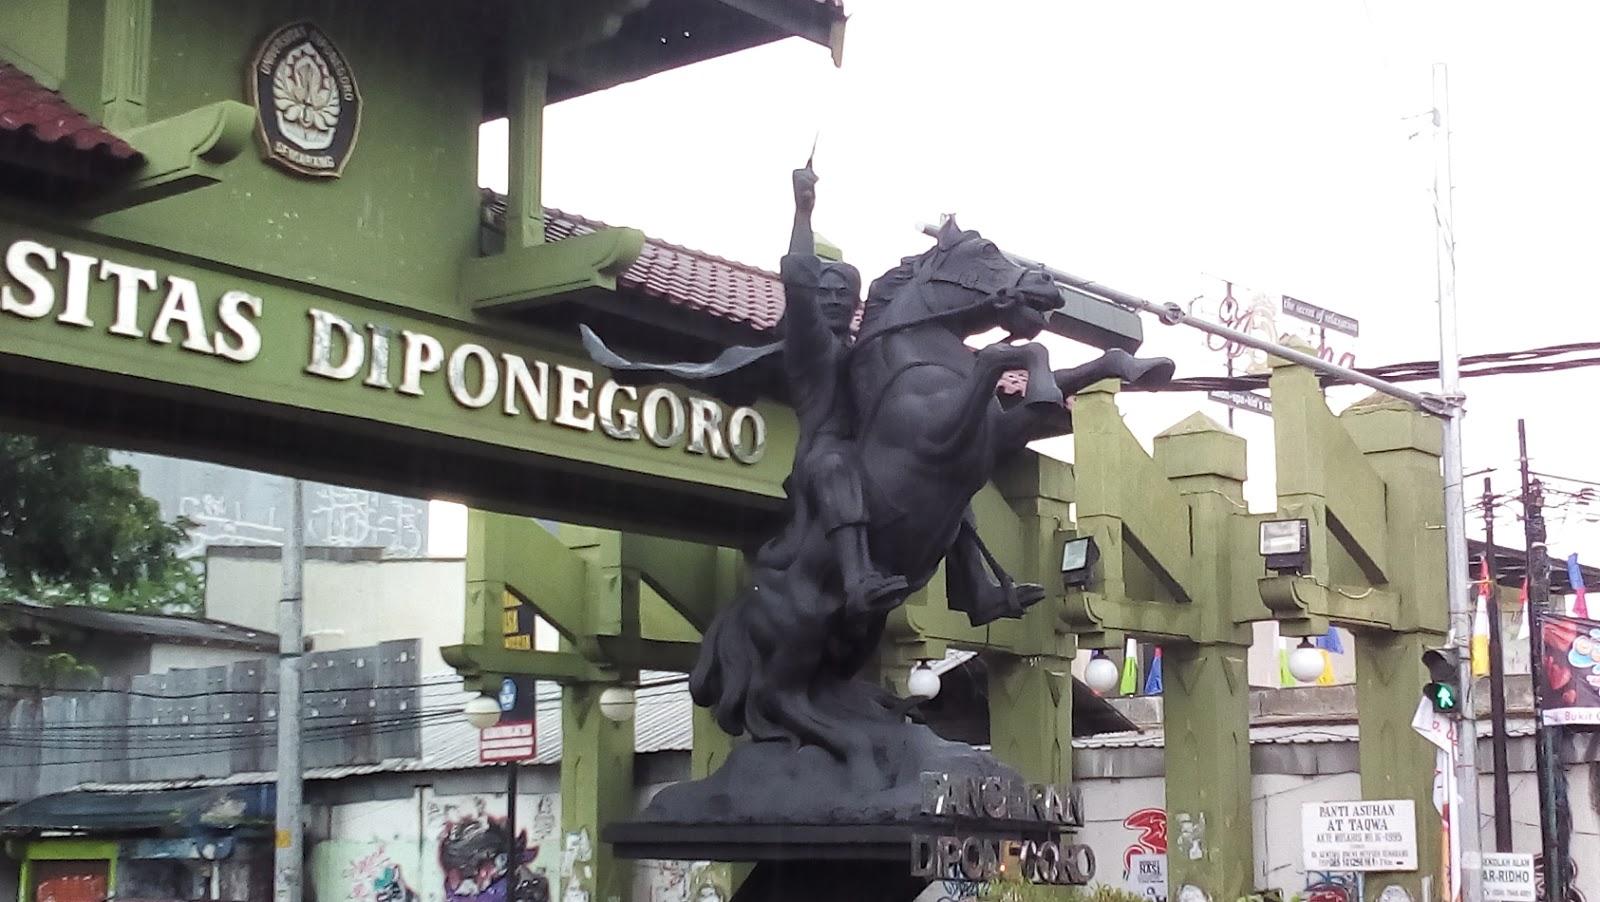 Gambar Pangeran Diponegoro Berwarna